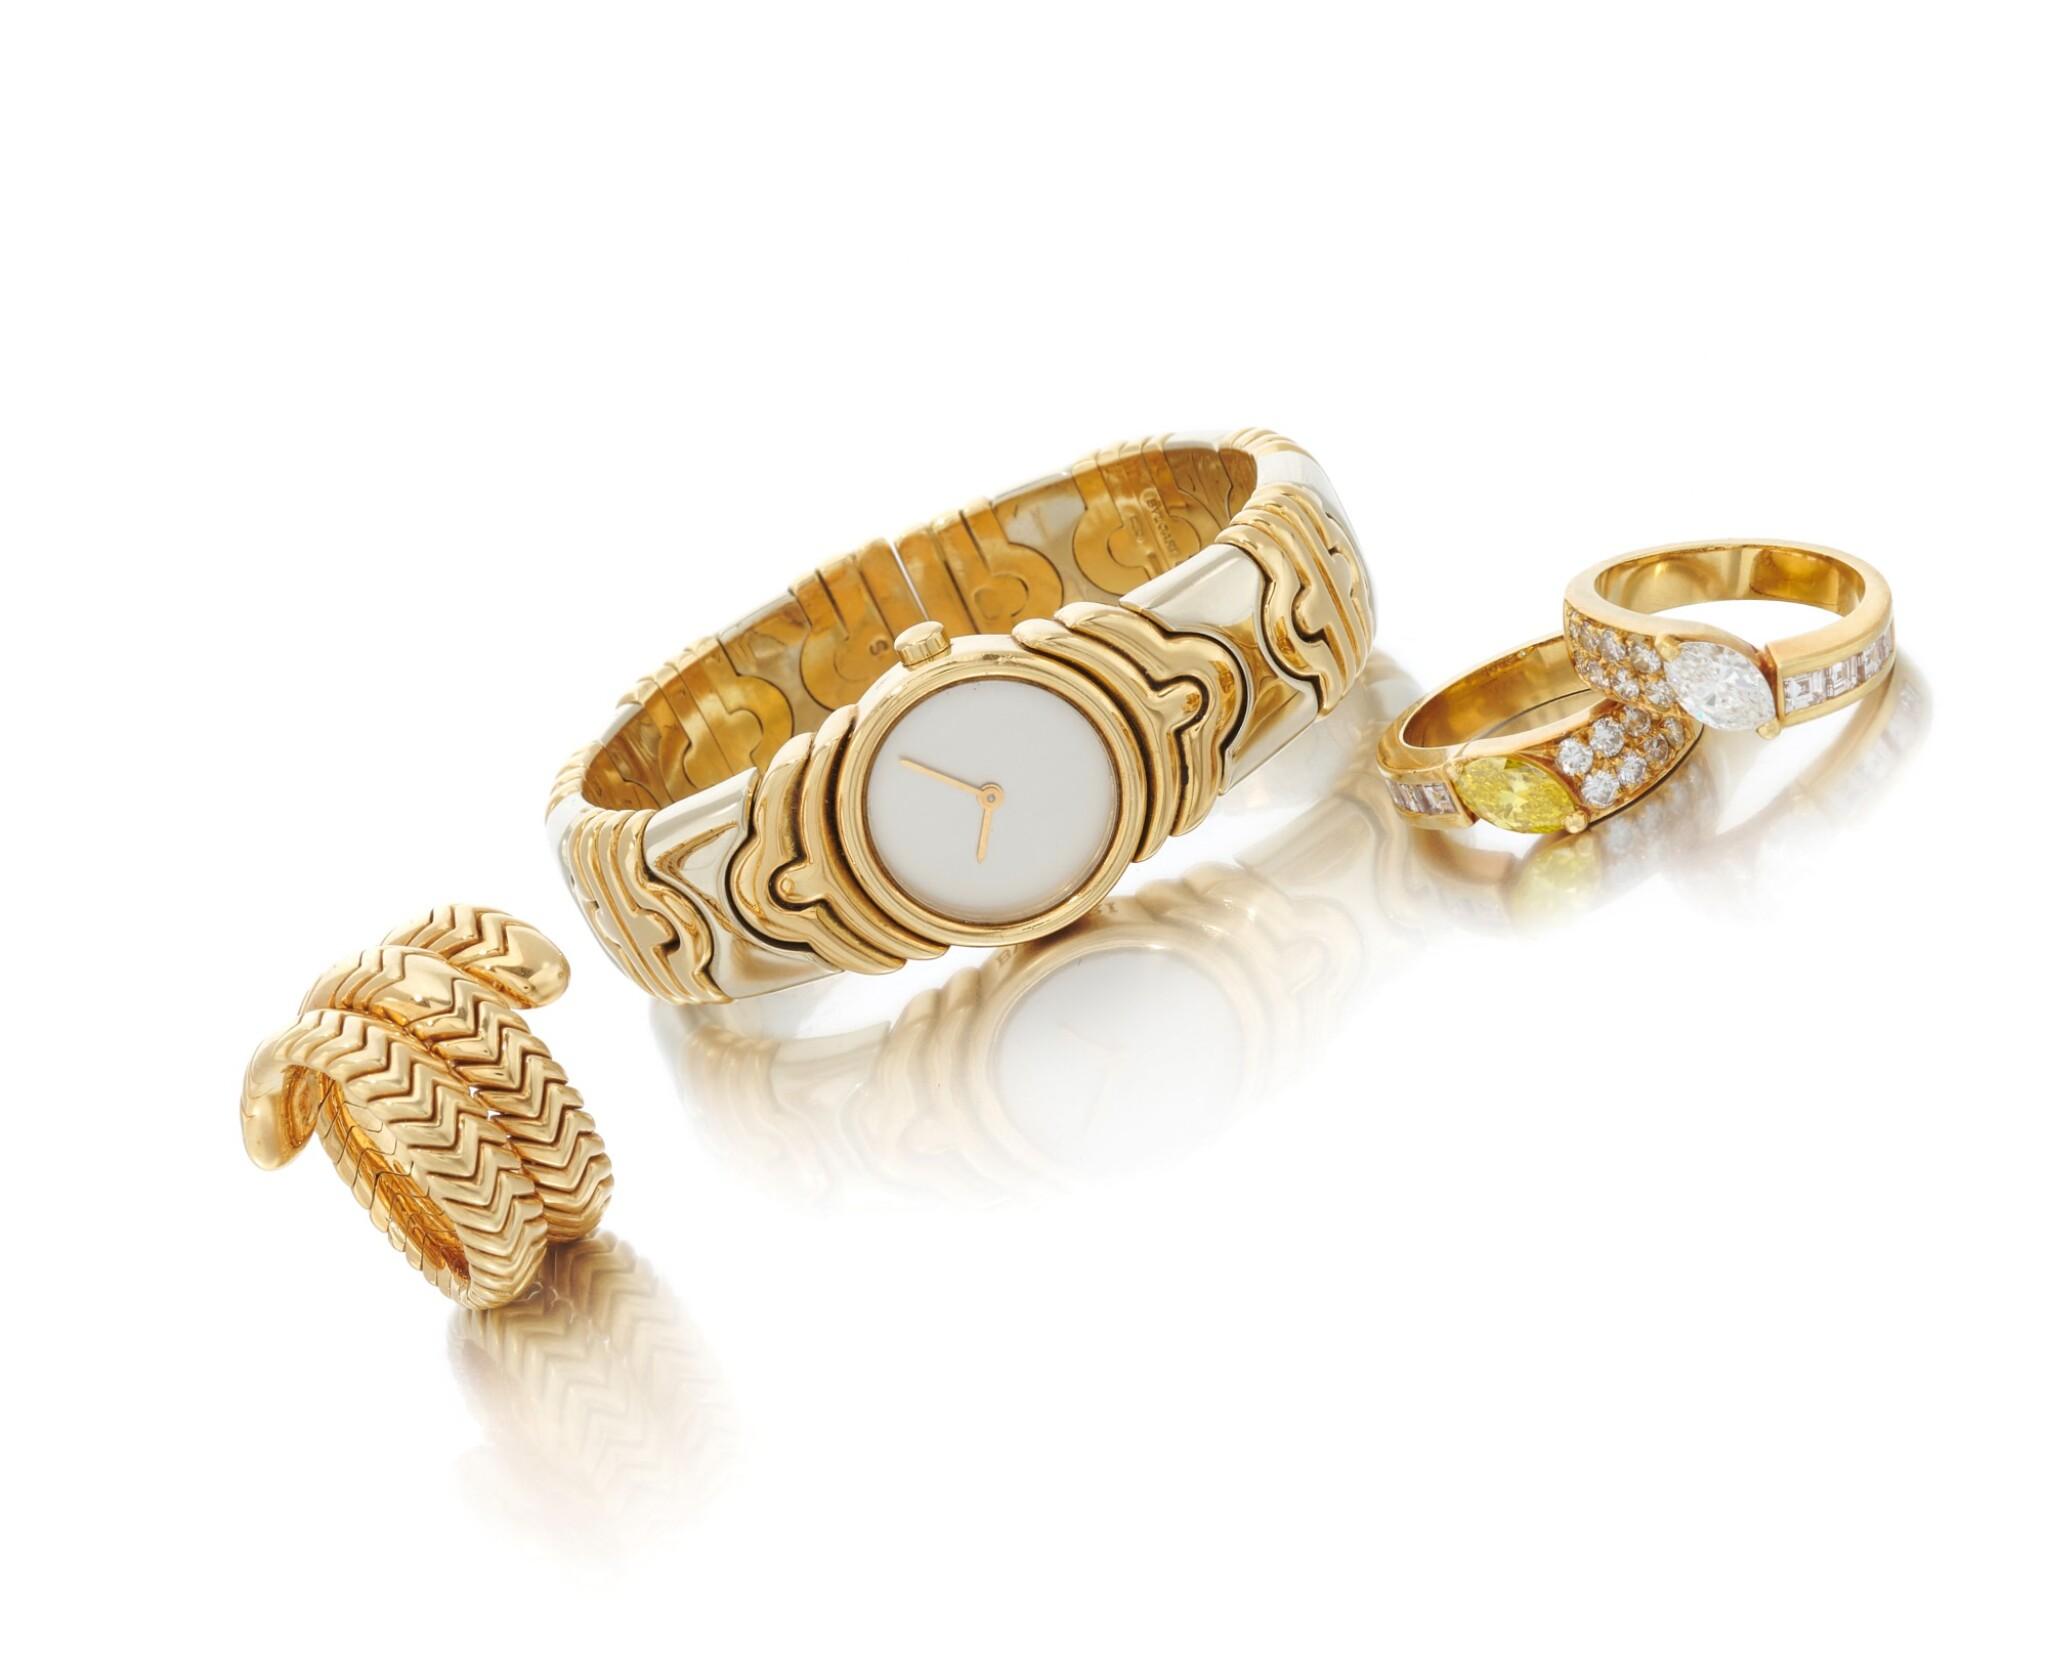 View 1 of Lot 107. 'Parentesi' bracelet-watch and 'Spiga' ring, Bulgari, and two diamond rings (Orologio da polso 'Parentesi' e anello 'Spiga', Bulgari, e due anelli in diamanti).